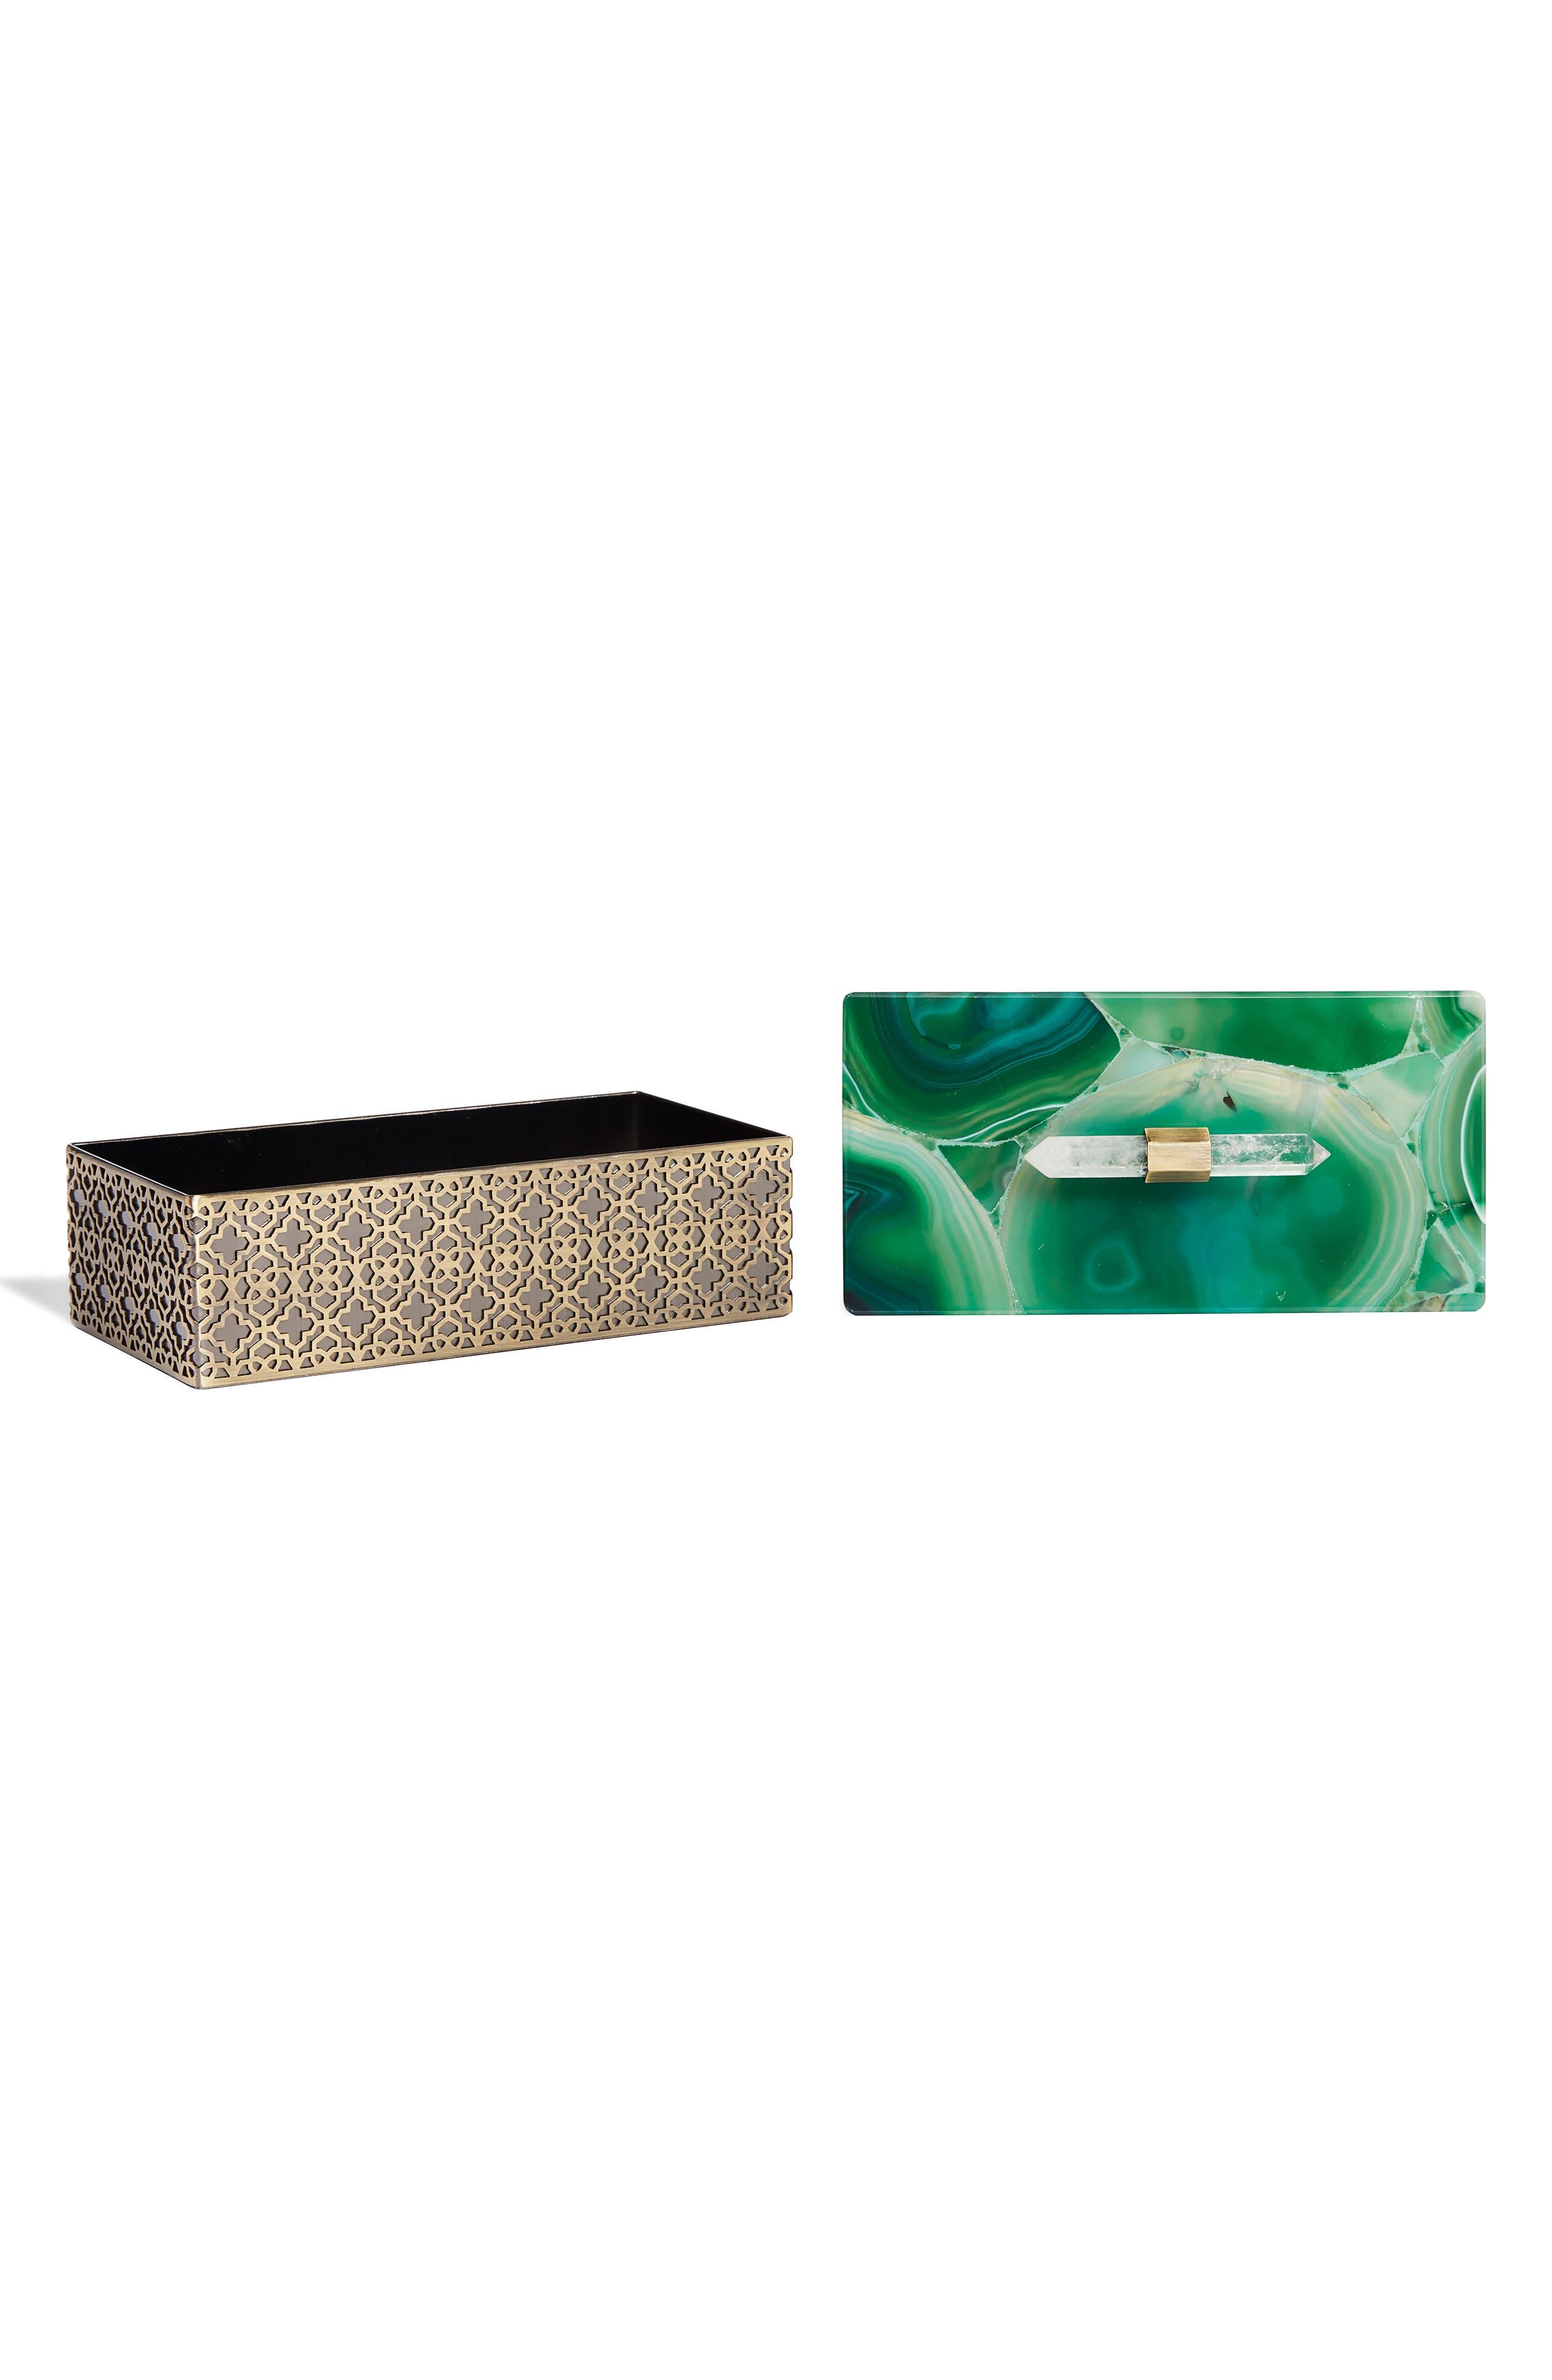 Kendra Scott Rectangle Filigree Box